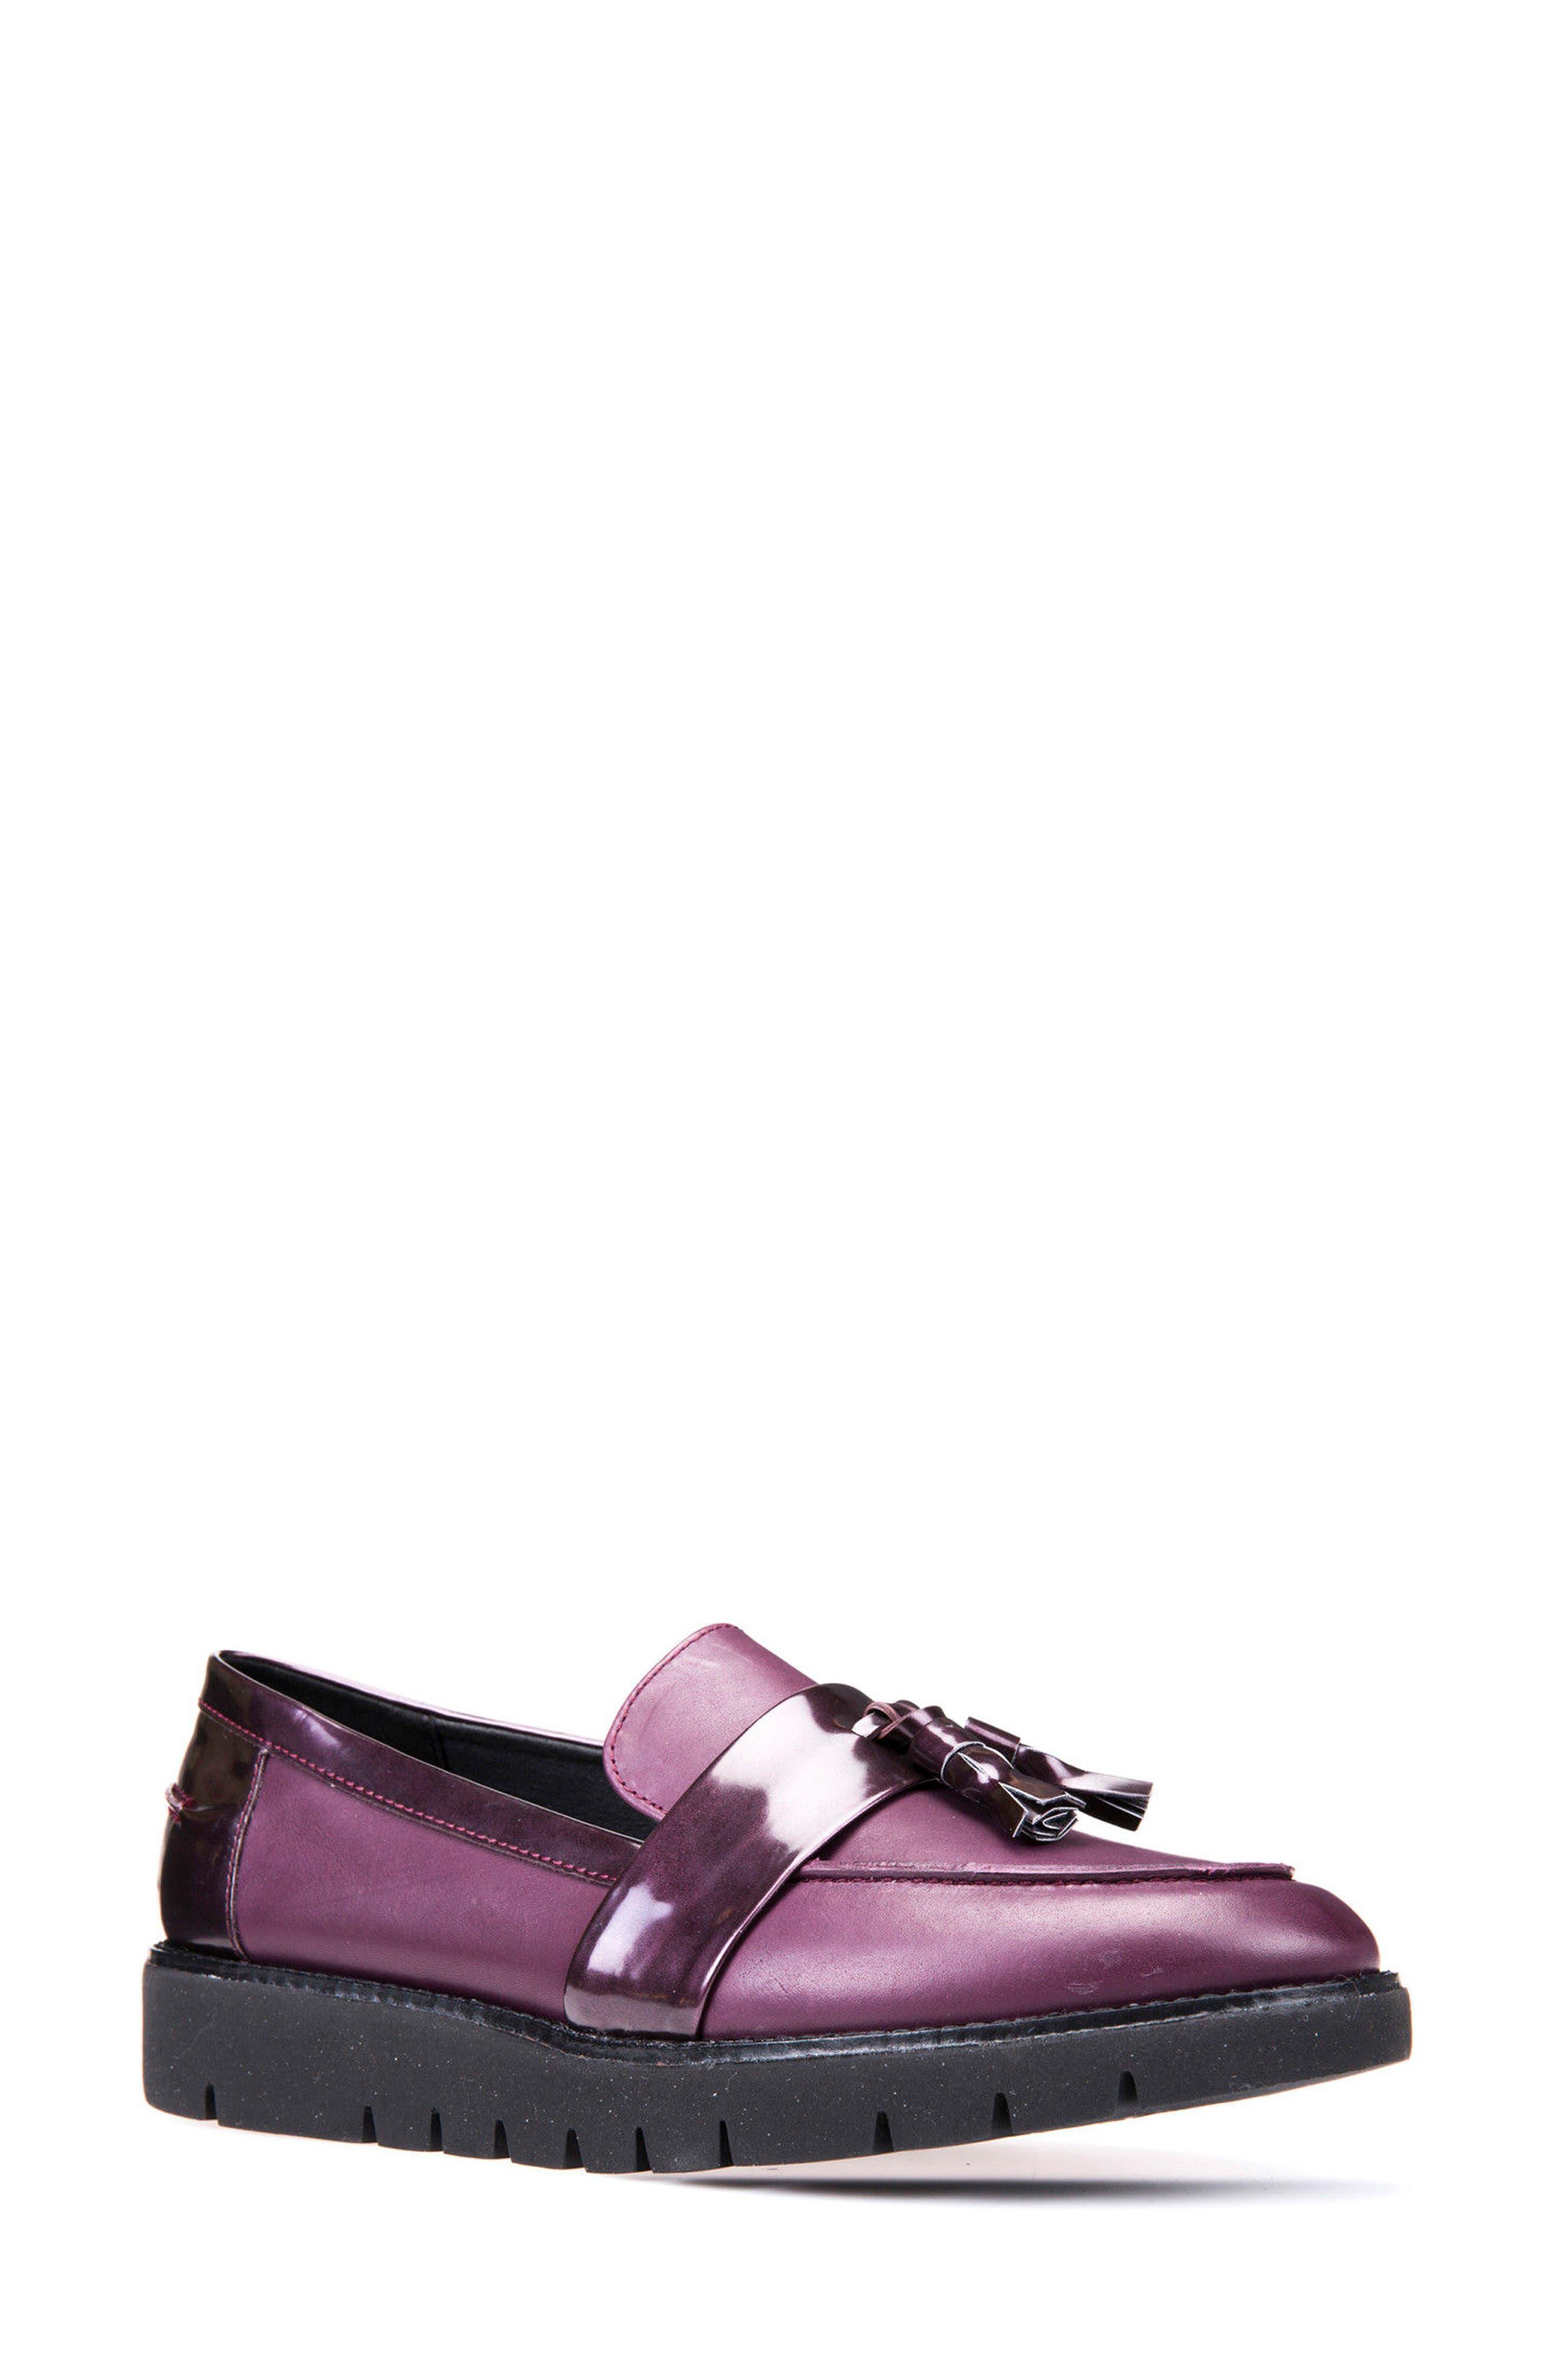 Geox Blenda Tassel Loafer (Women)